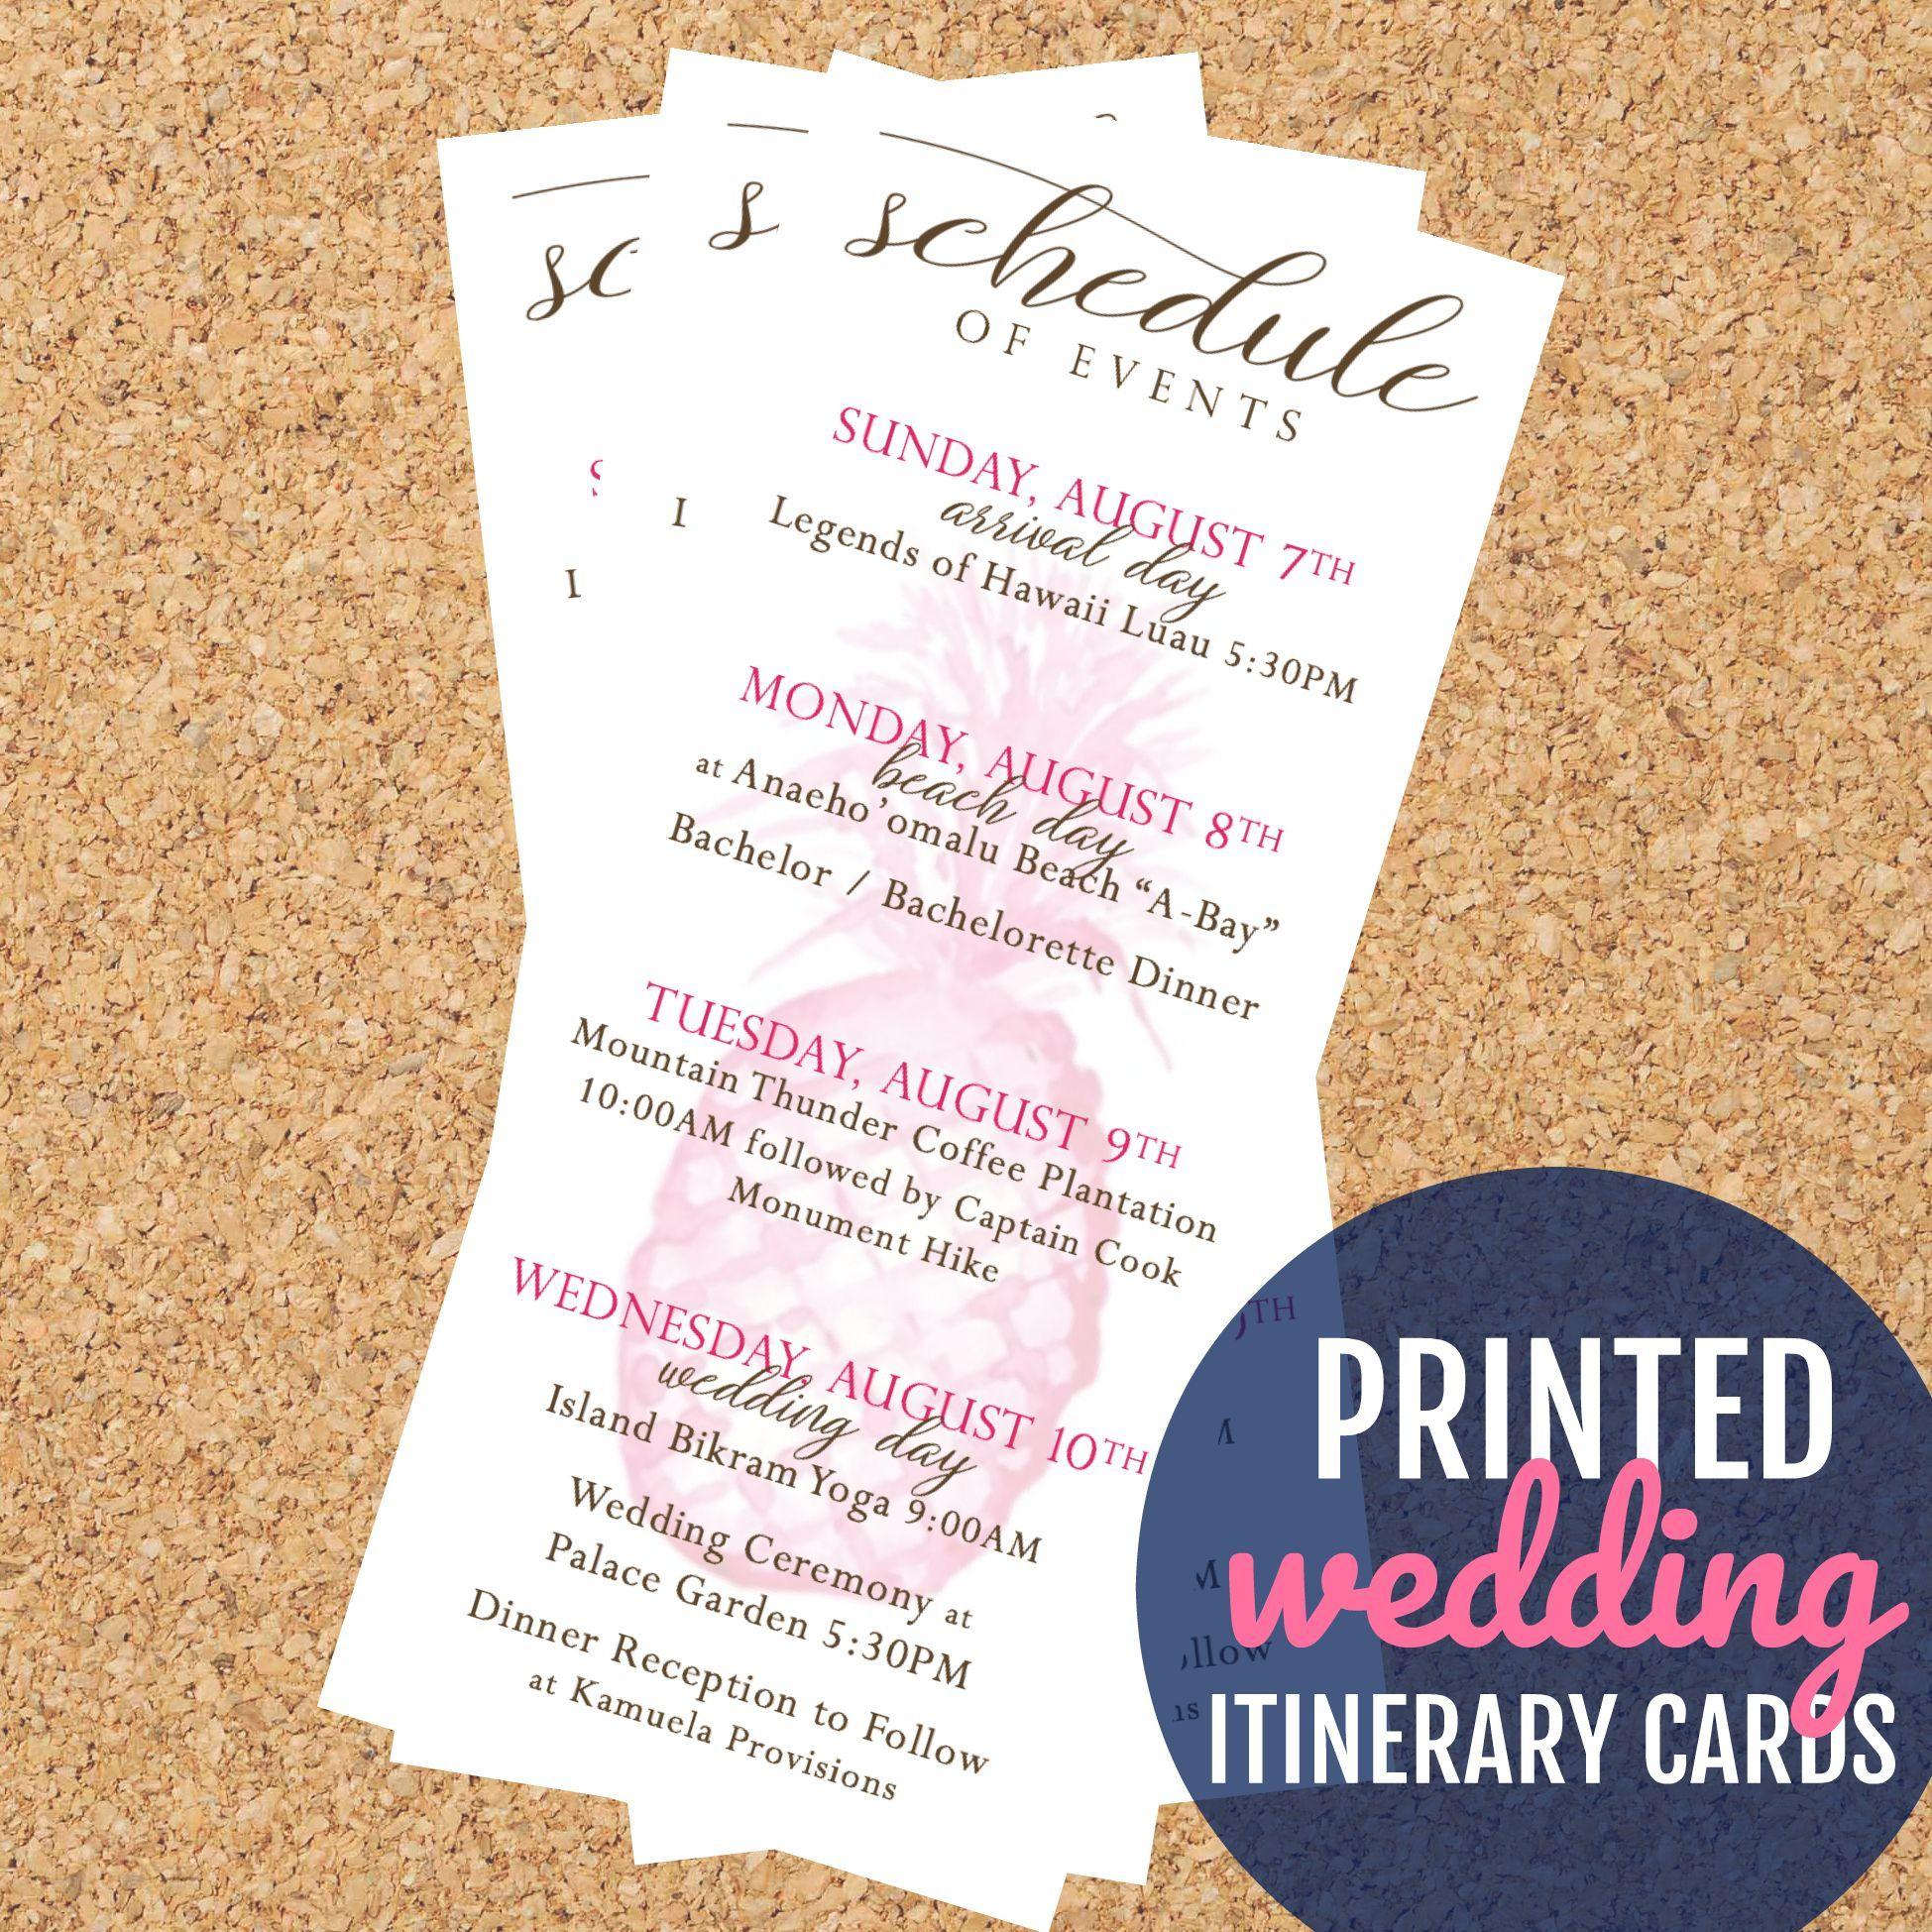 Hawaii wedding itinerary cards printed pineapple wedding